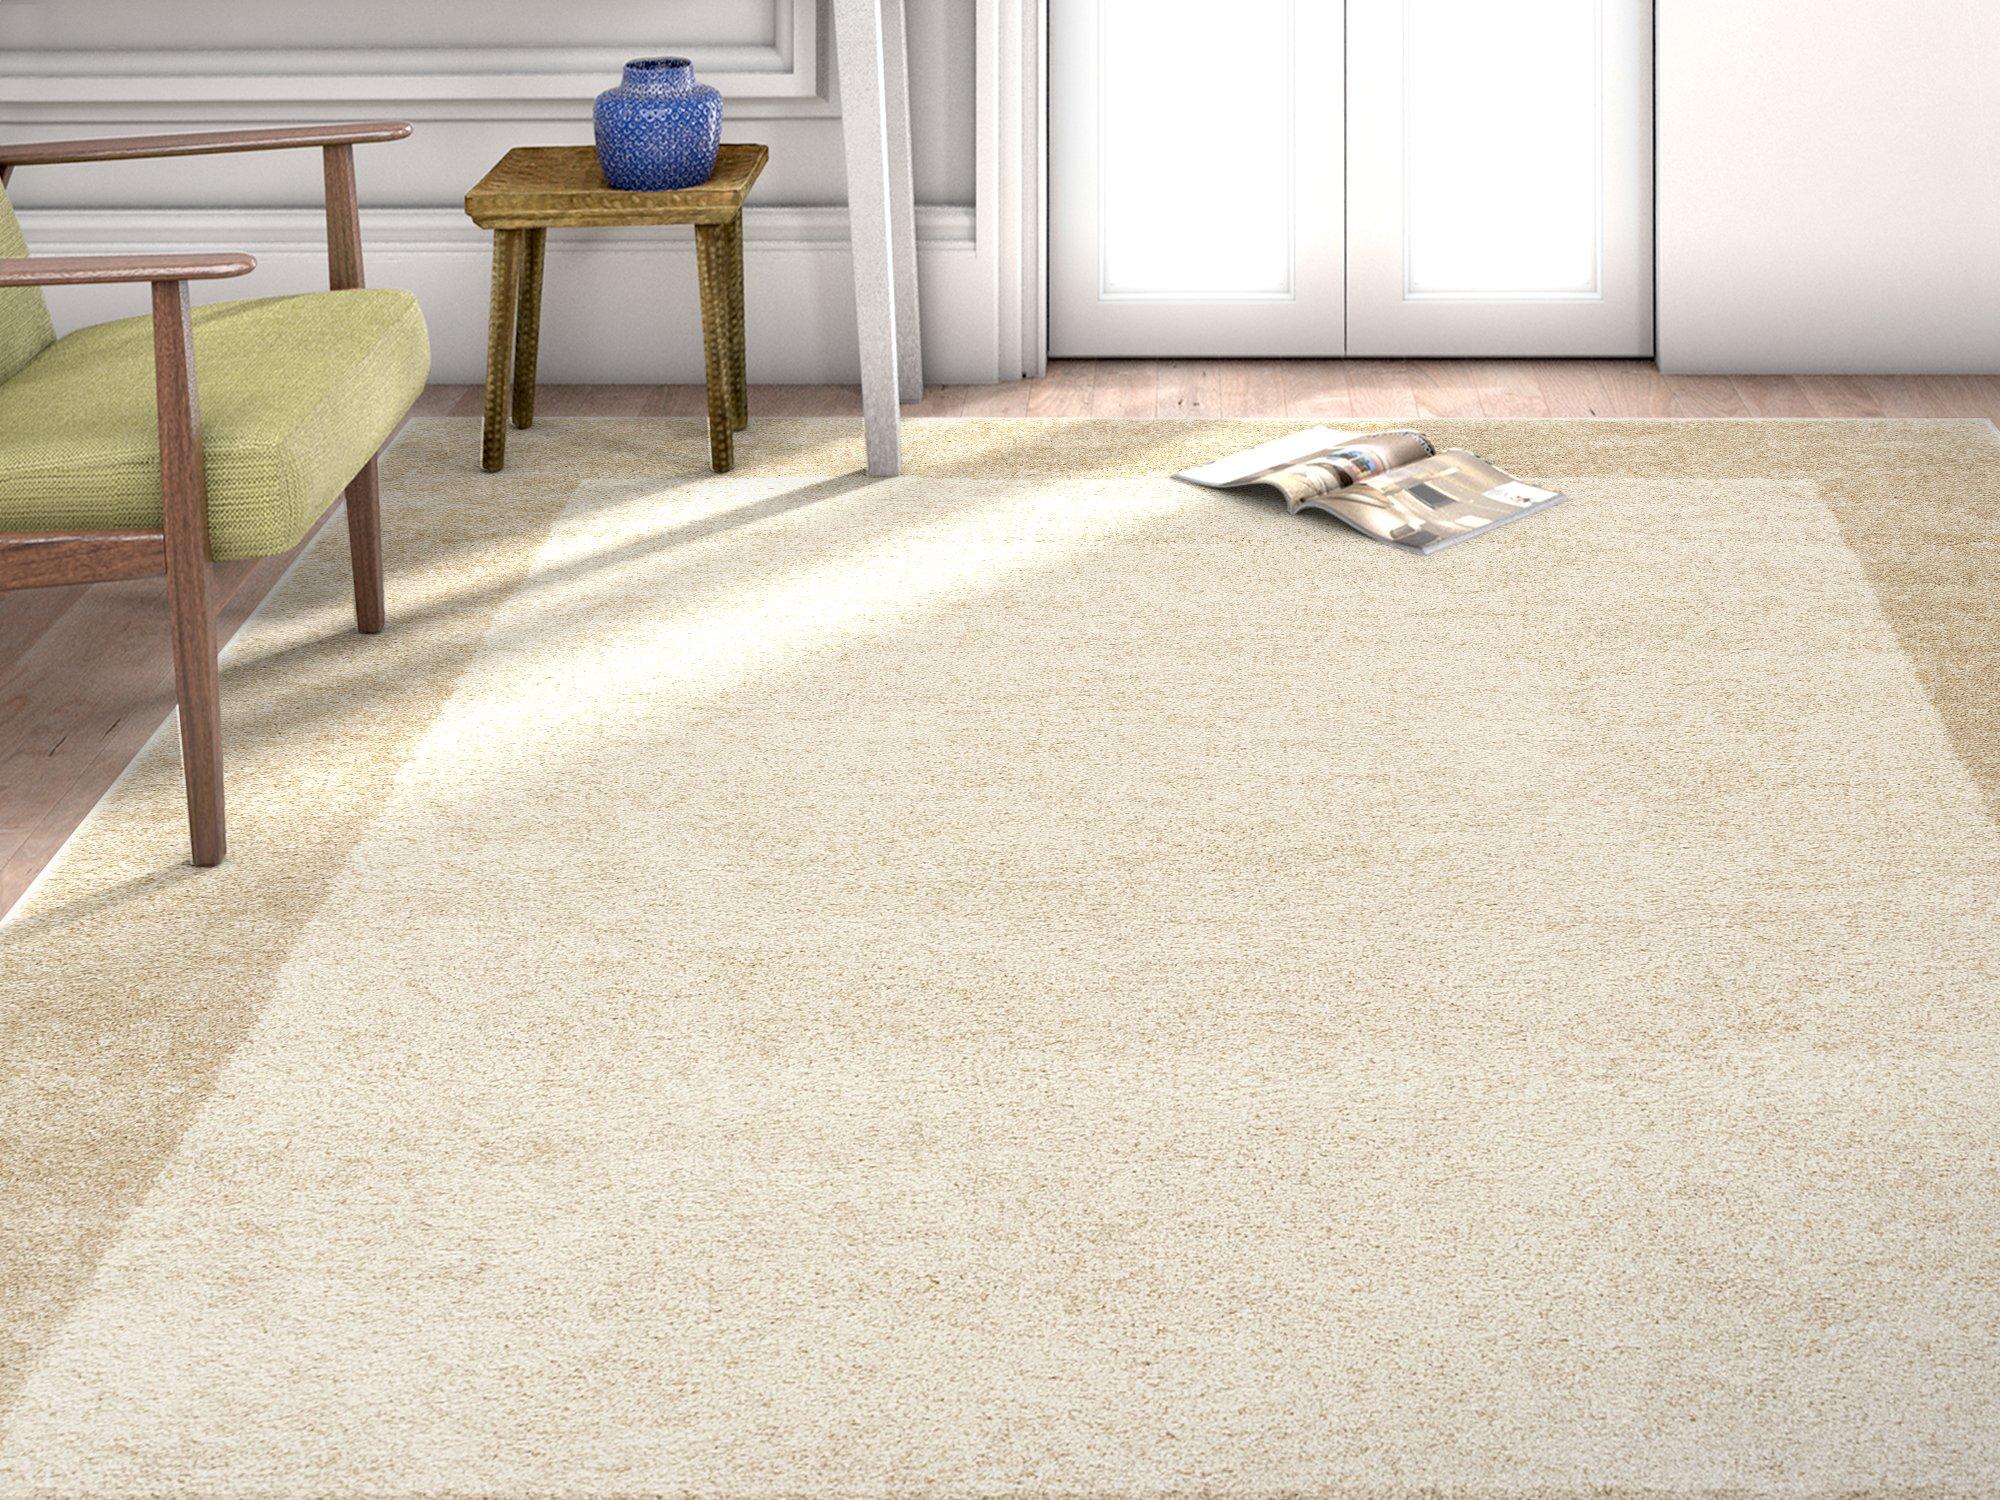 HomeWay Bordered Beige 5'3 x 7'3 Mid-century shaded pattern soft Rug modern Velvety bright soft Area Rug